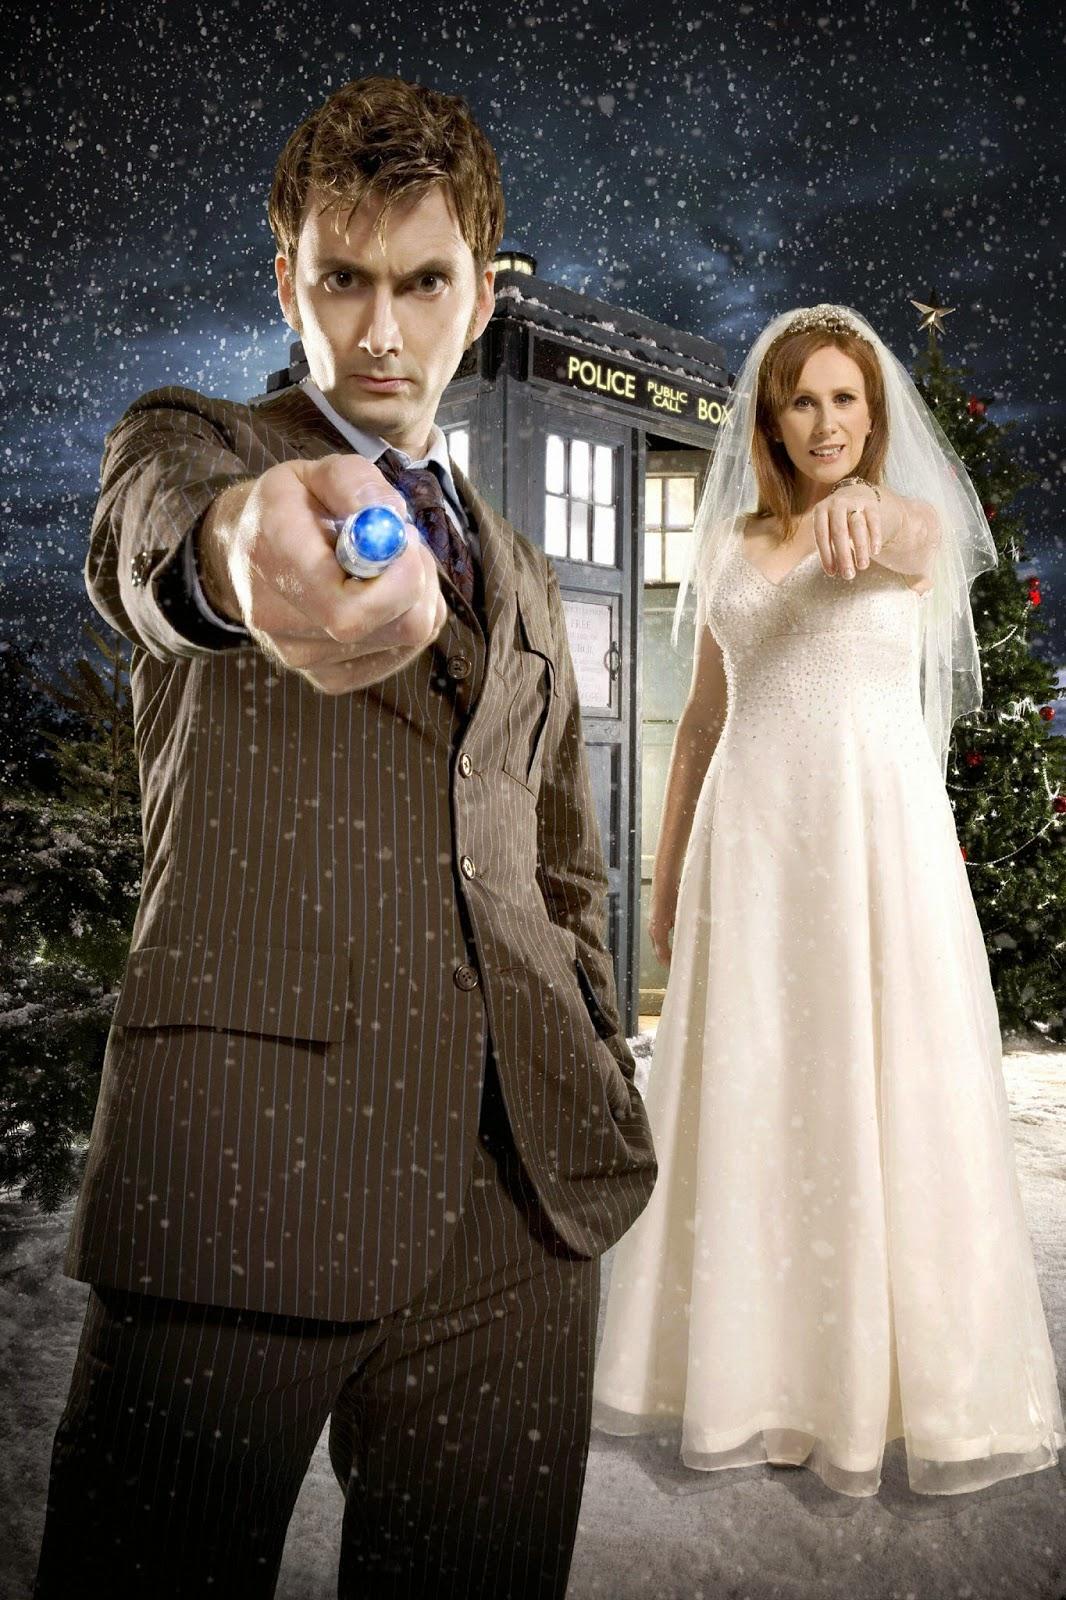 PHOTOS: David Tennant & Catherine Tate In The Runaway Bride ...